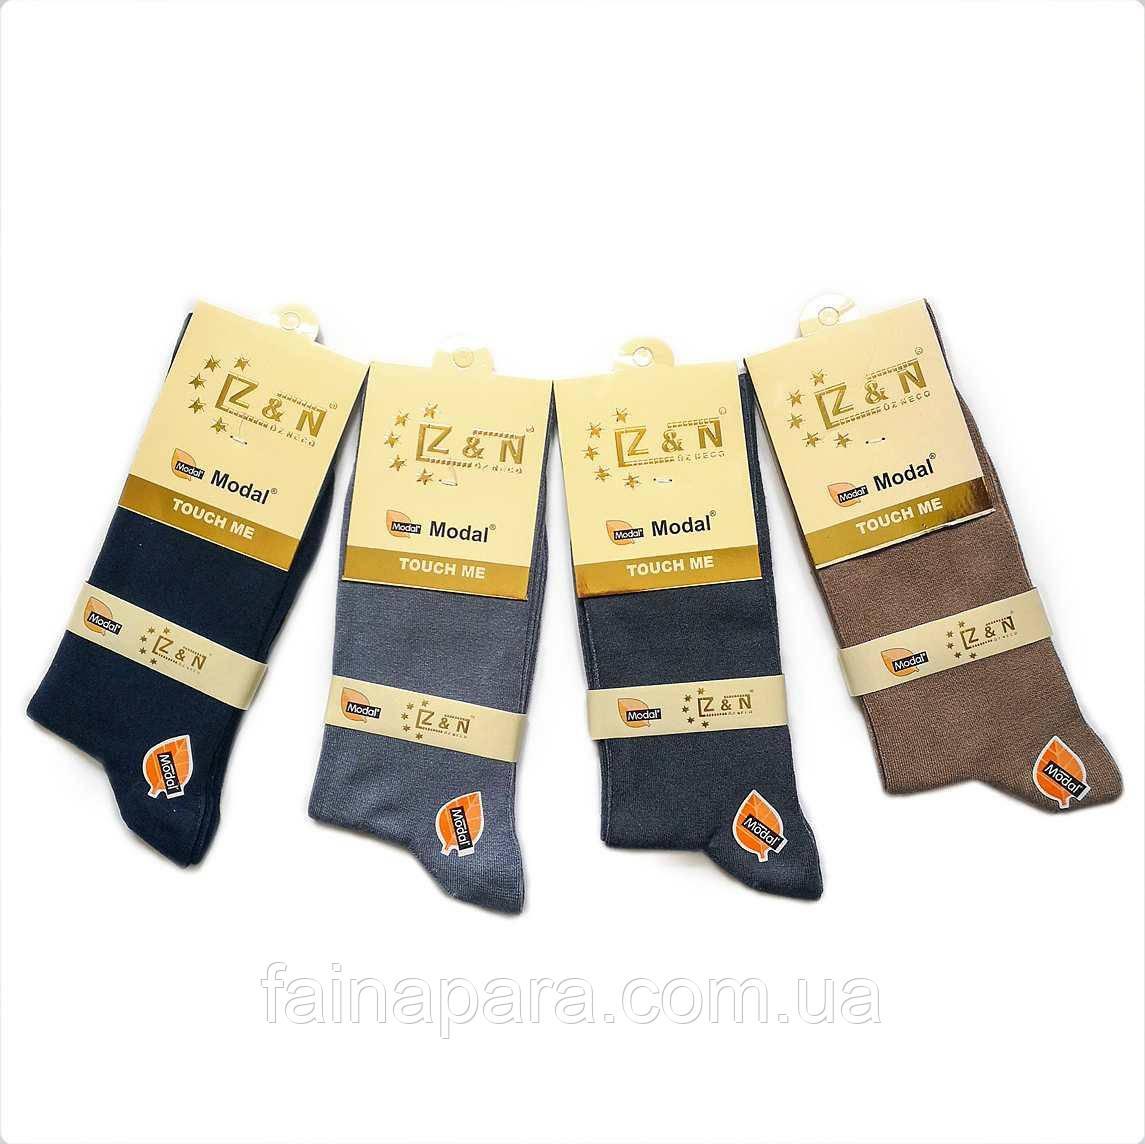 Мужские однотонные носки Модал Z&N